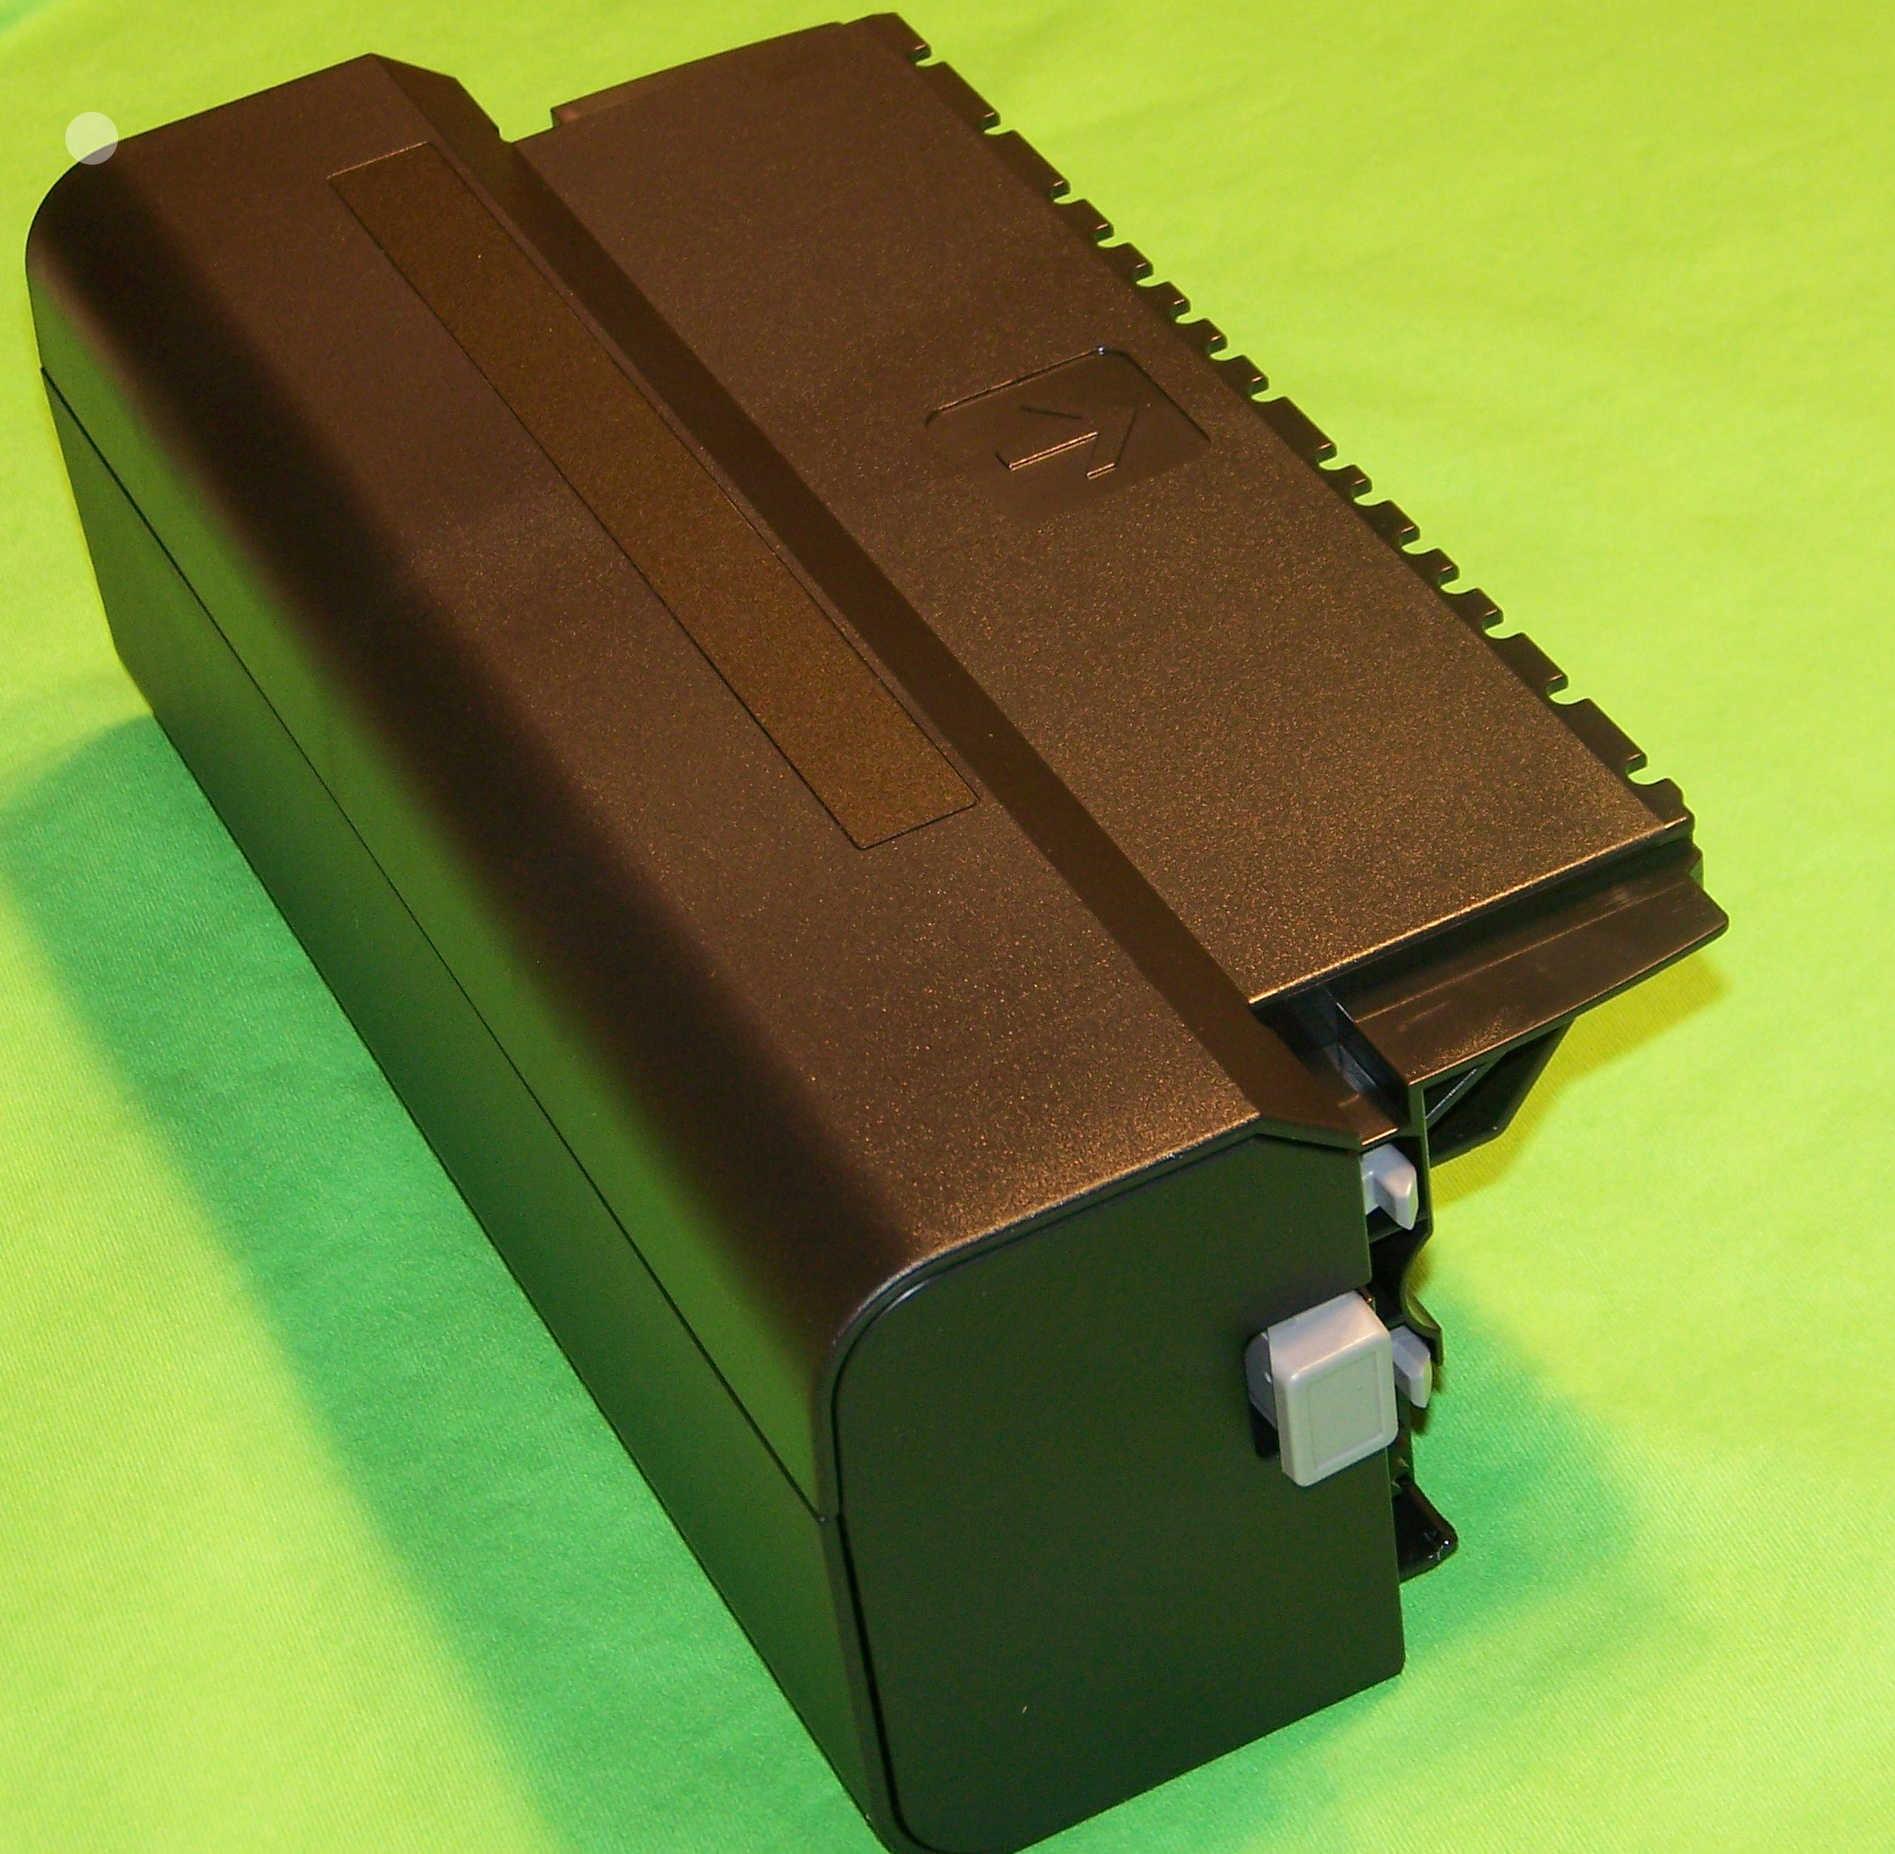 Arkon Tab804 Heavy Duty Aluminum C Clamp Universal Tablet